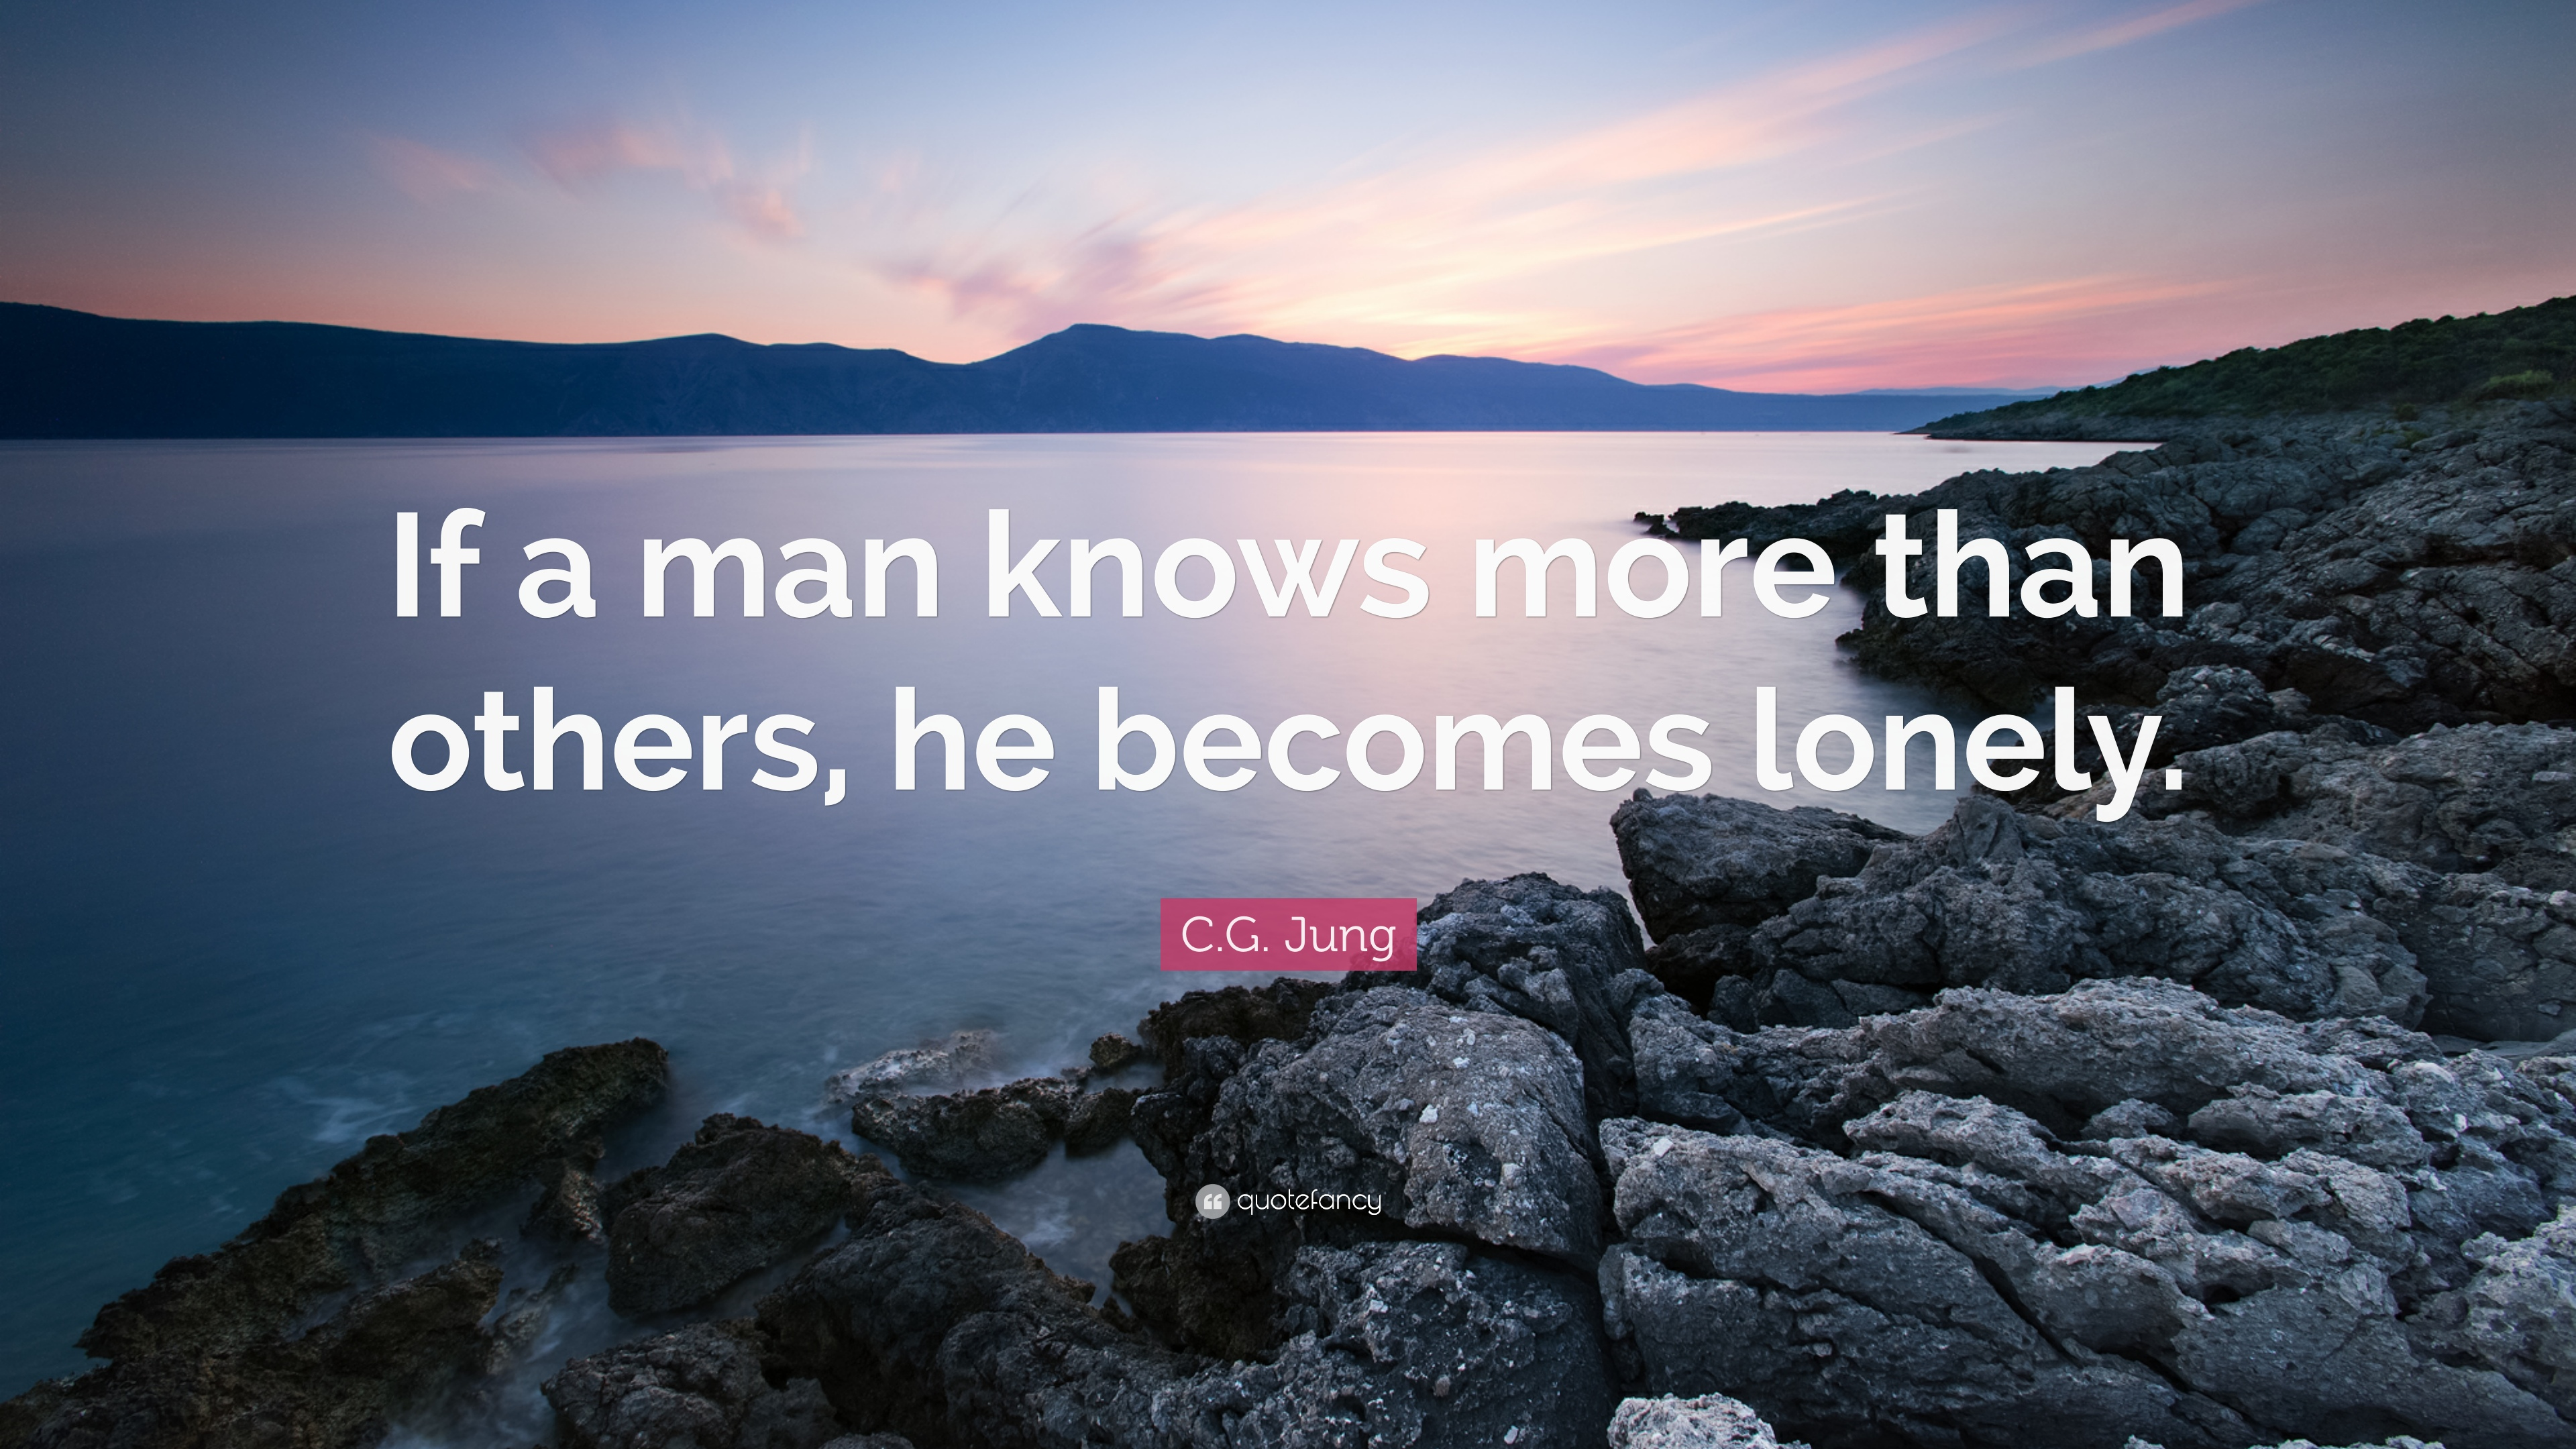 lonely quotes quotefancy